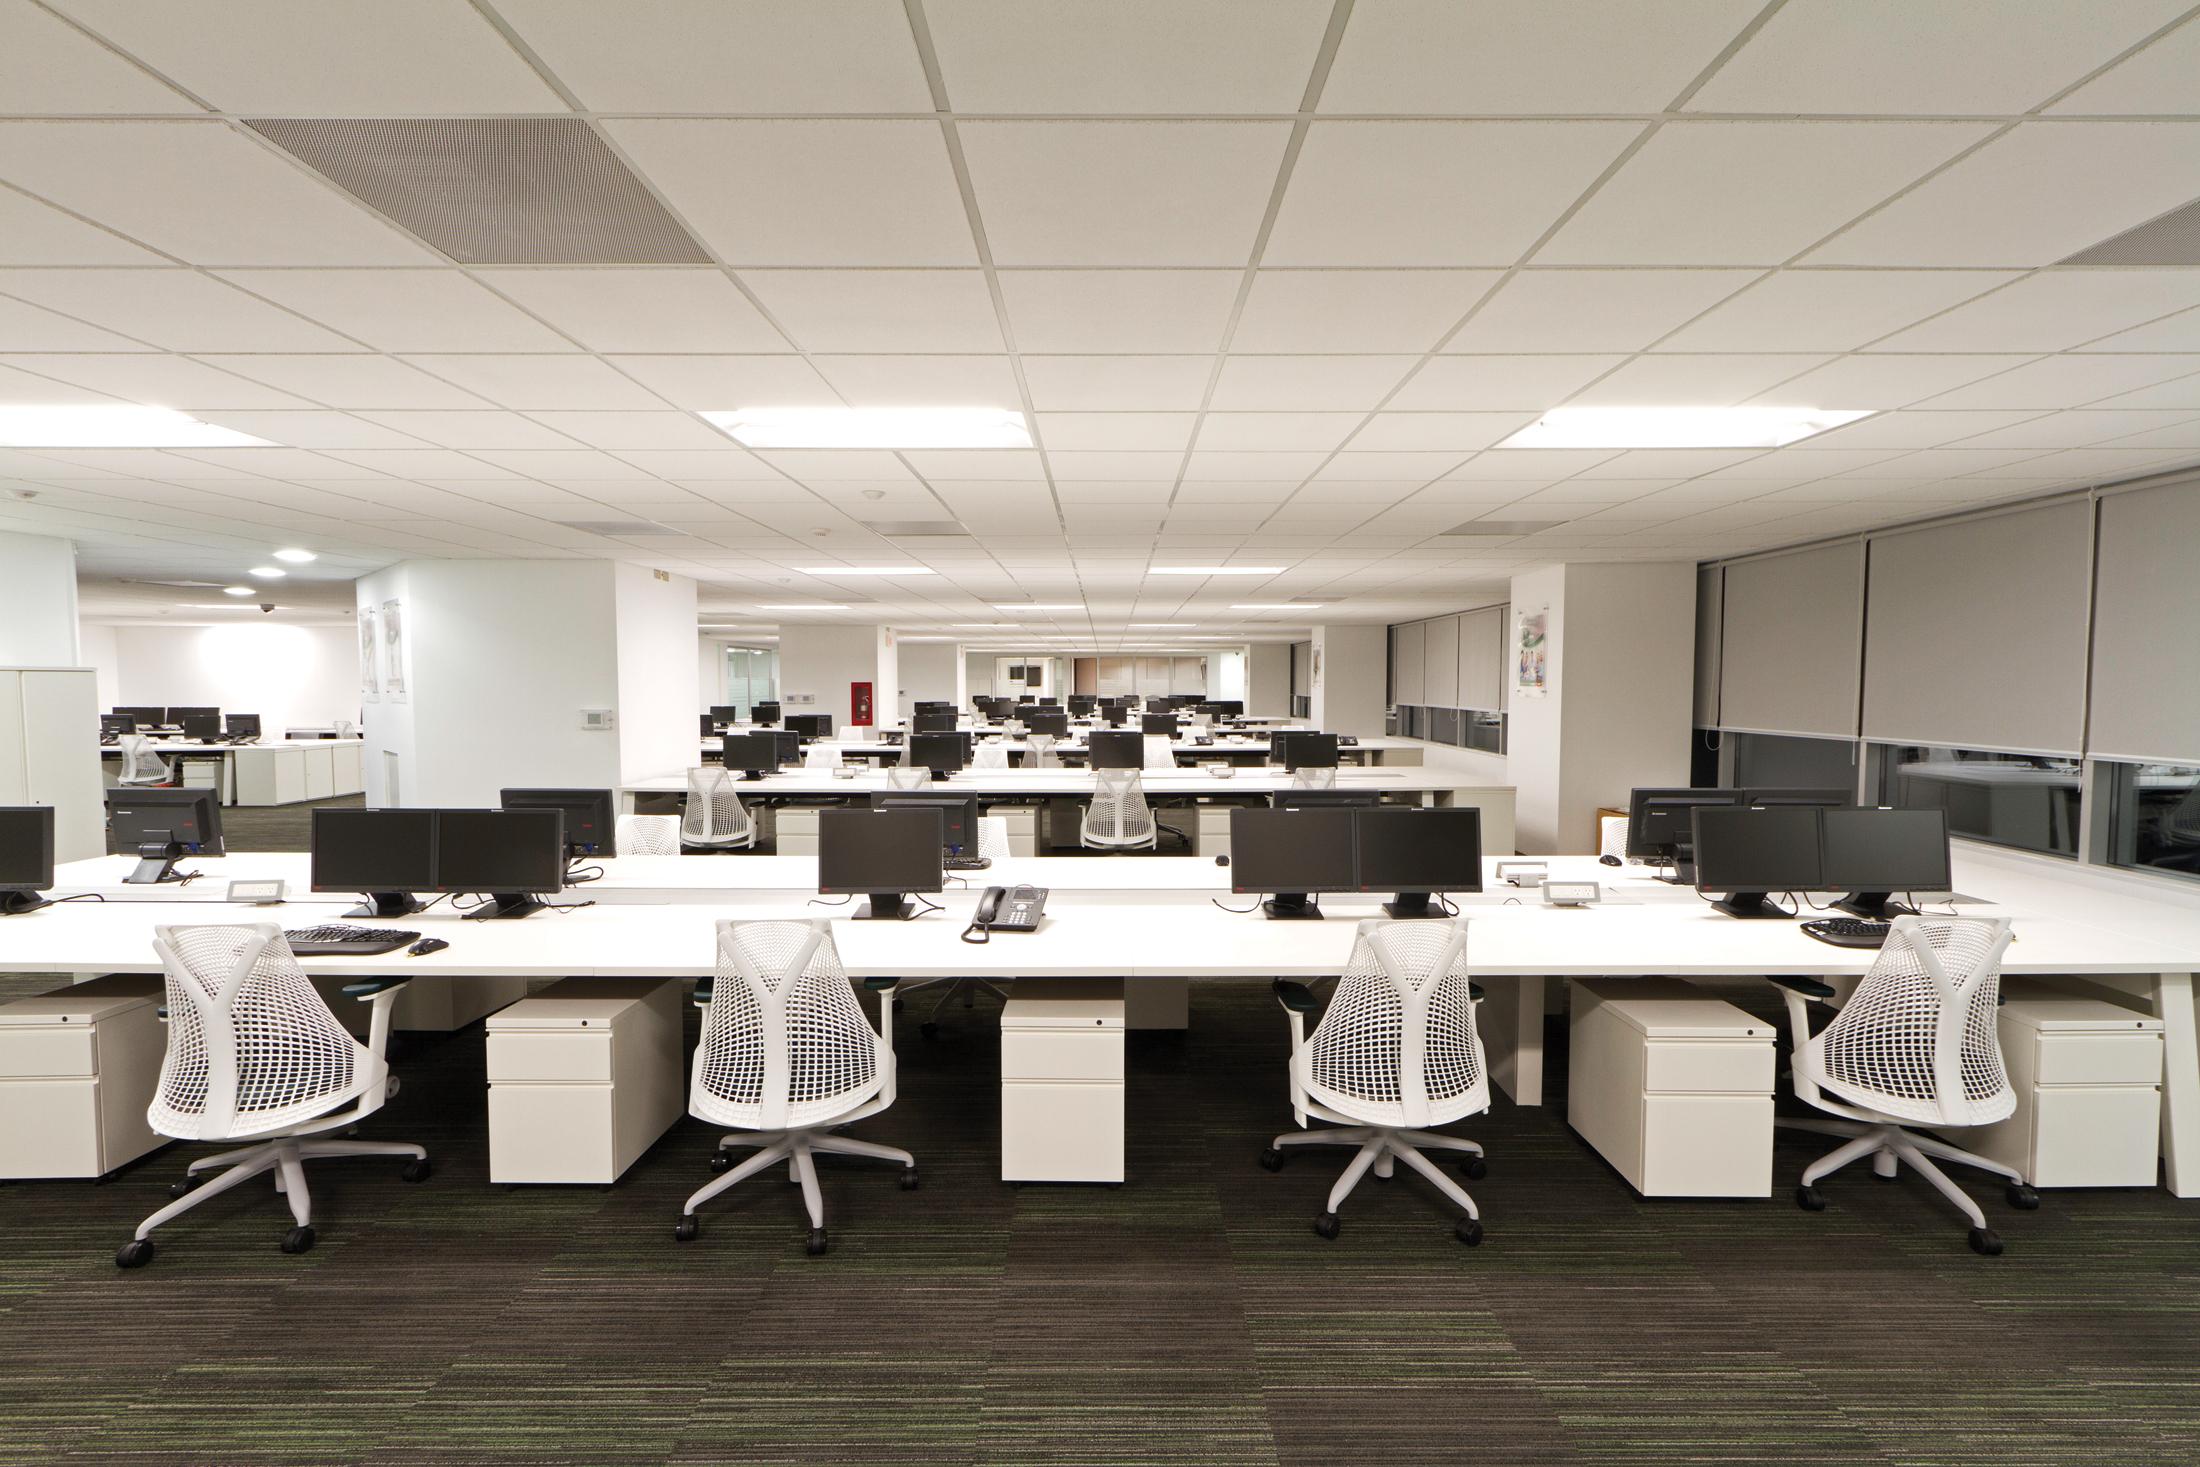 Revista de arquitectura y dise o peruarki oficinas for Arquitectura de oficinas